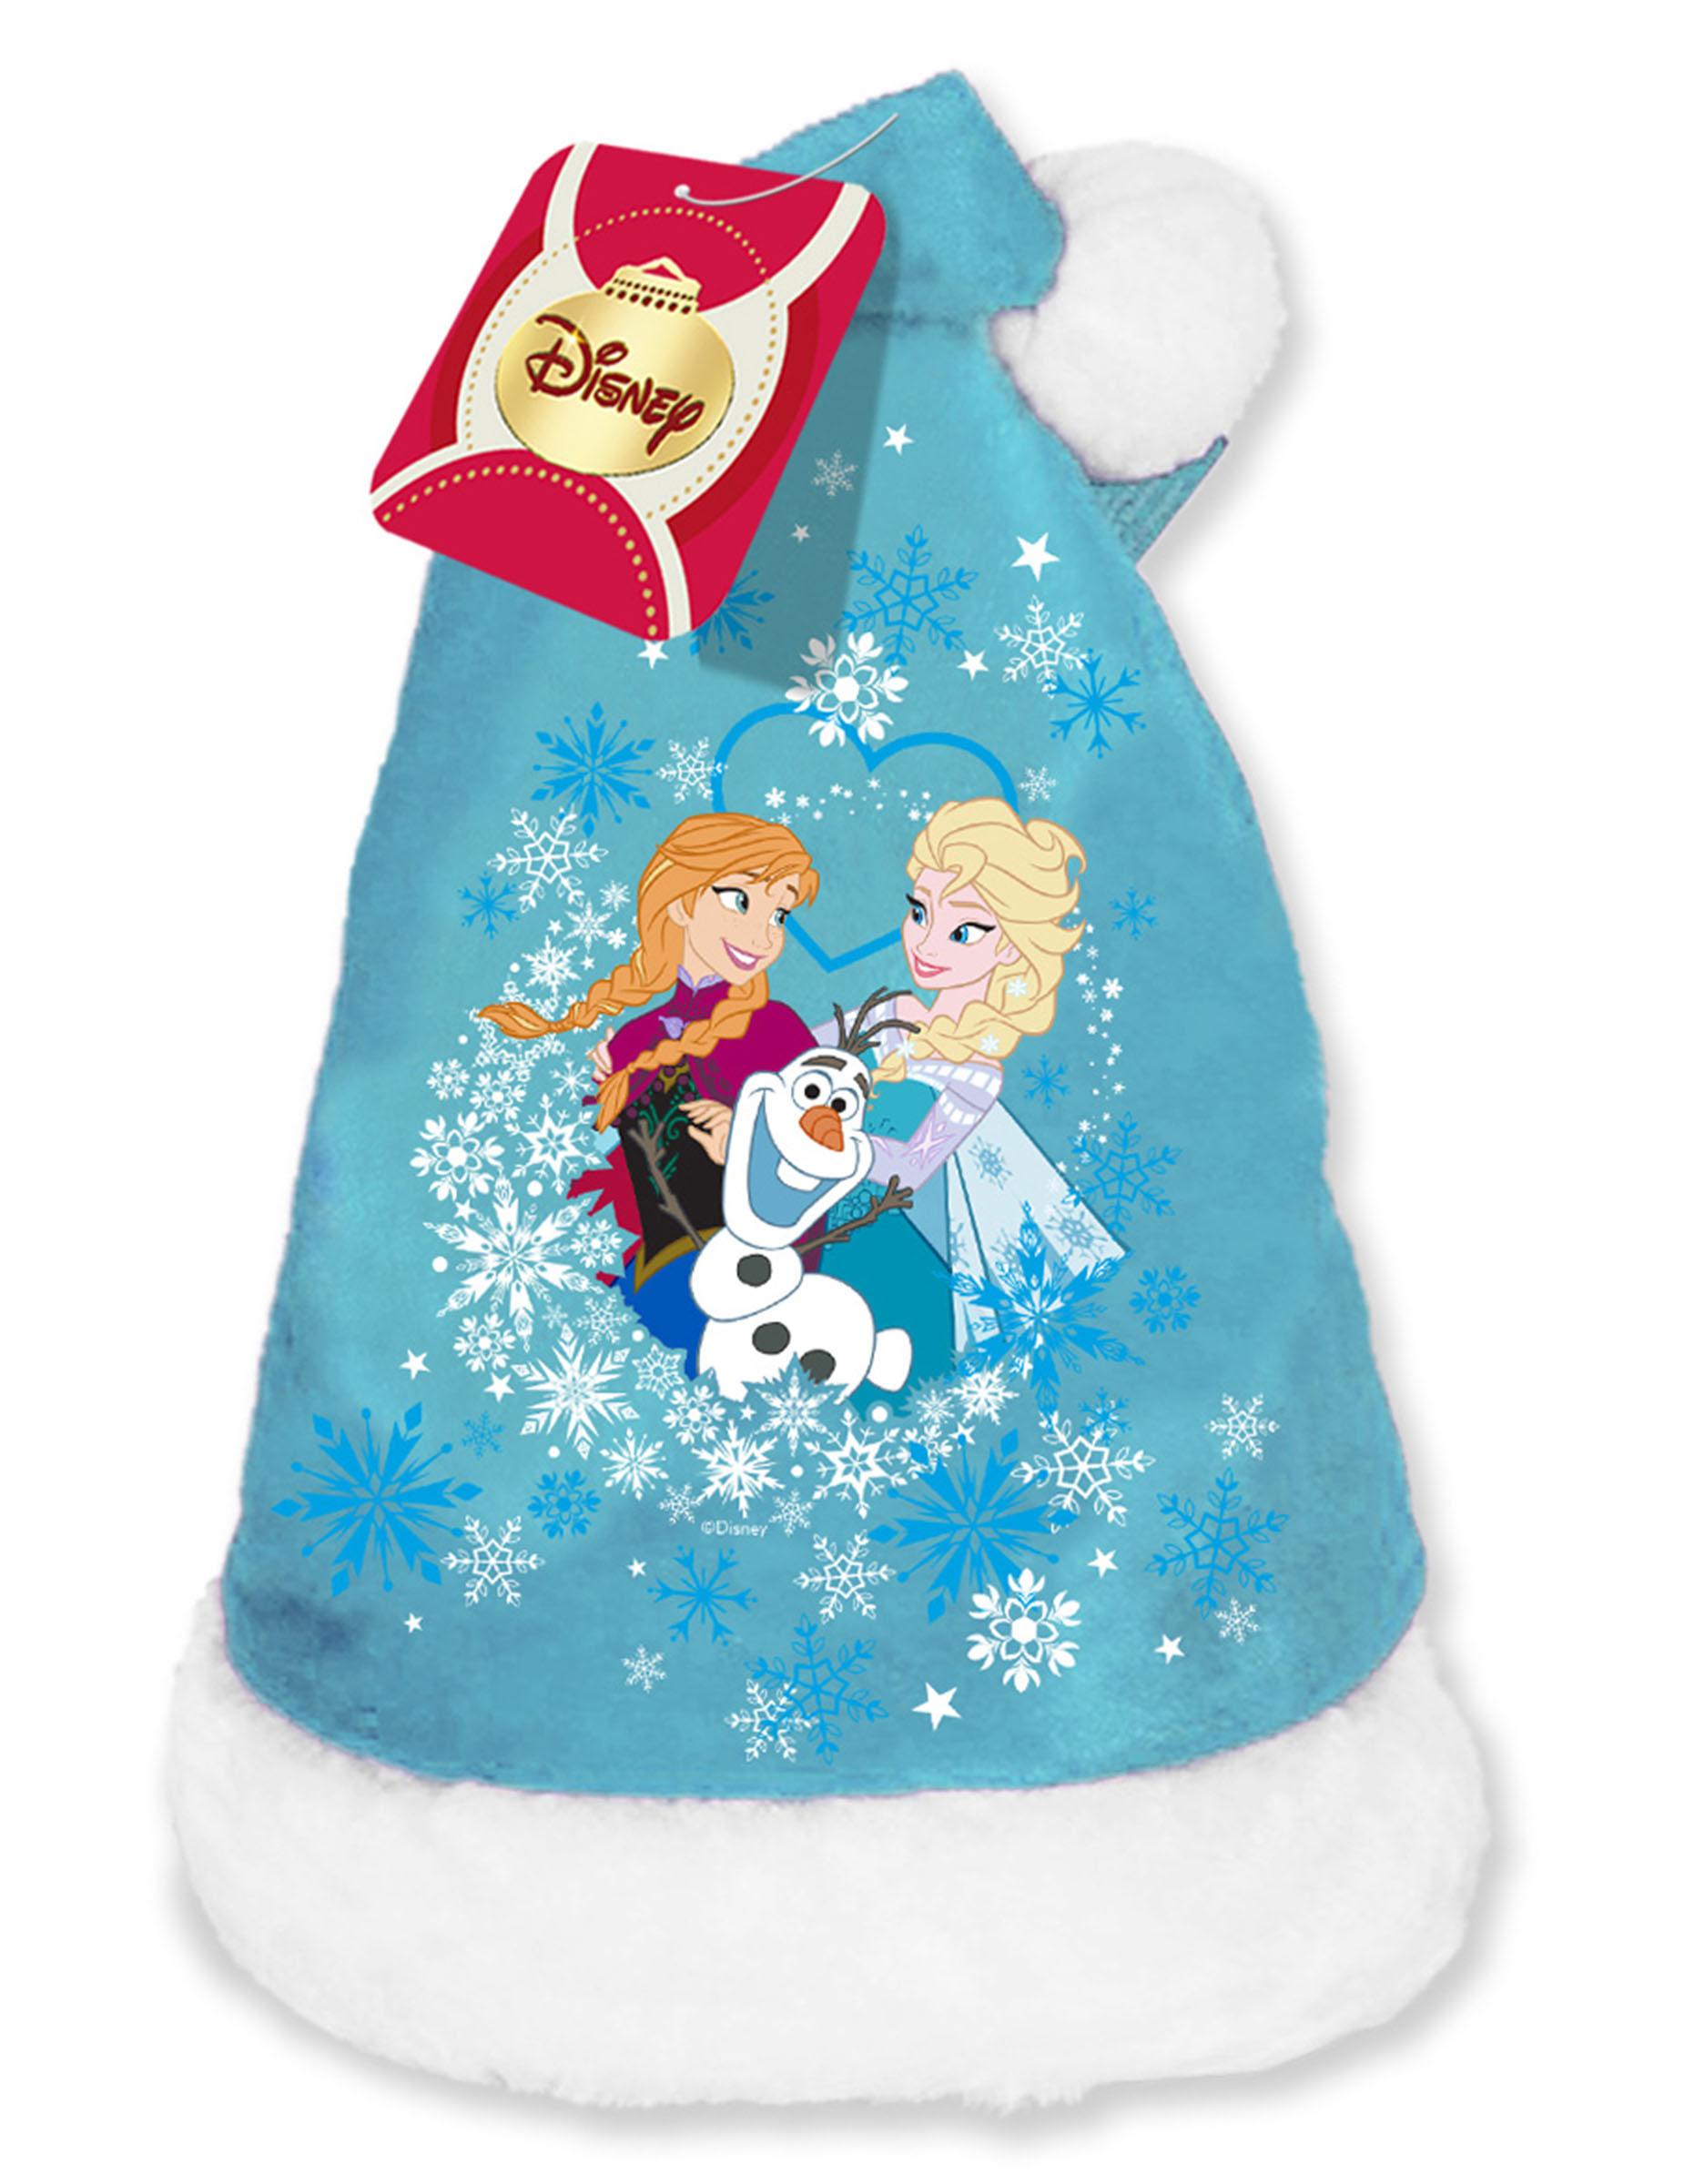 Decoration Noel Reine Des Neiges